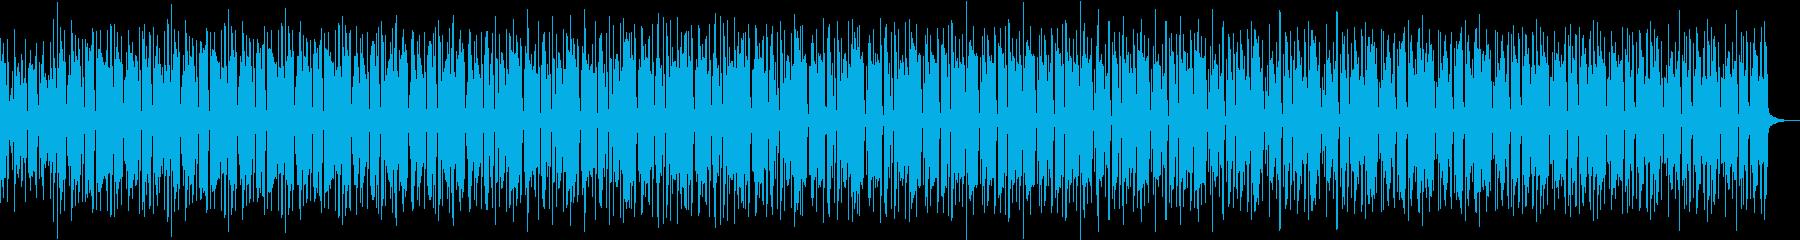 j街の動きをピアノで描写の再生済みの波形